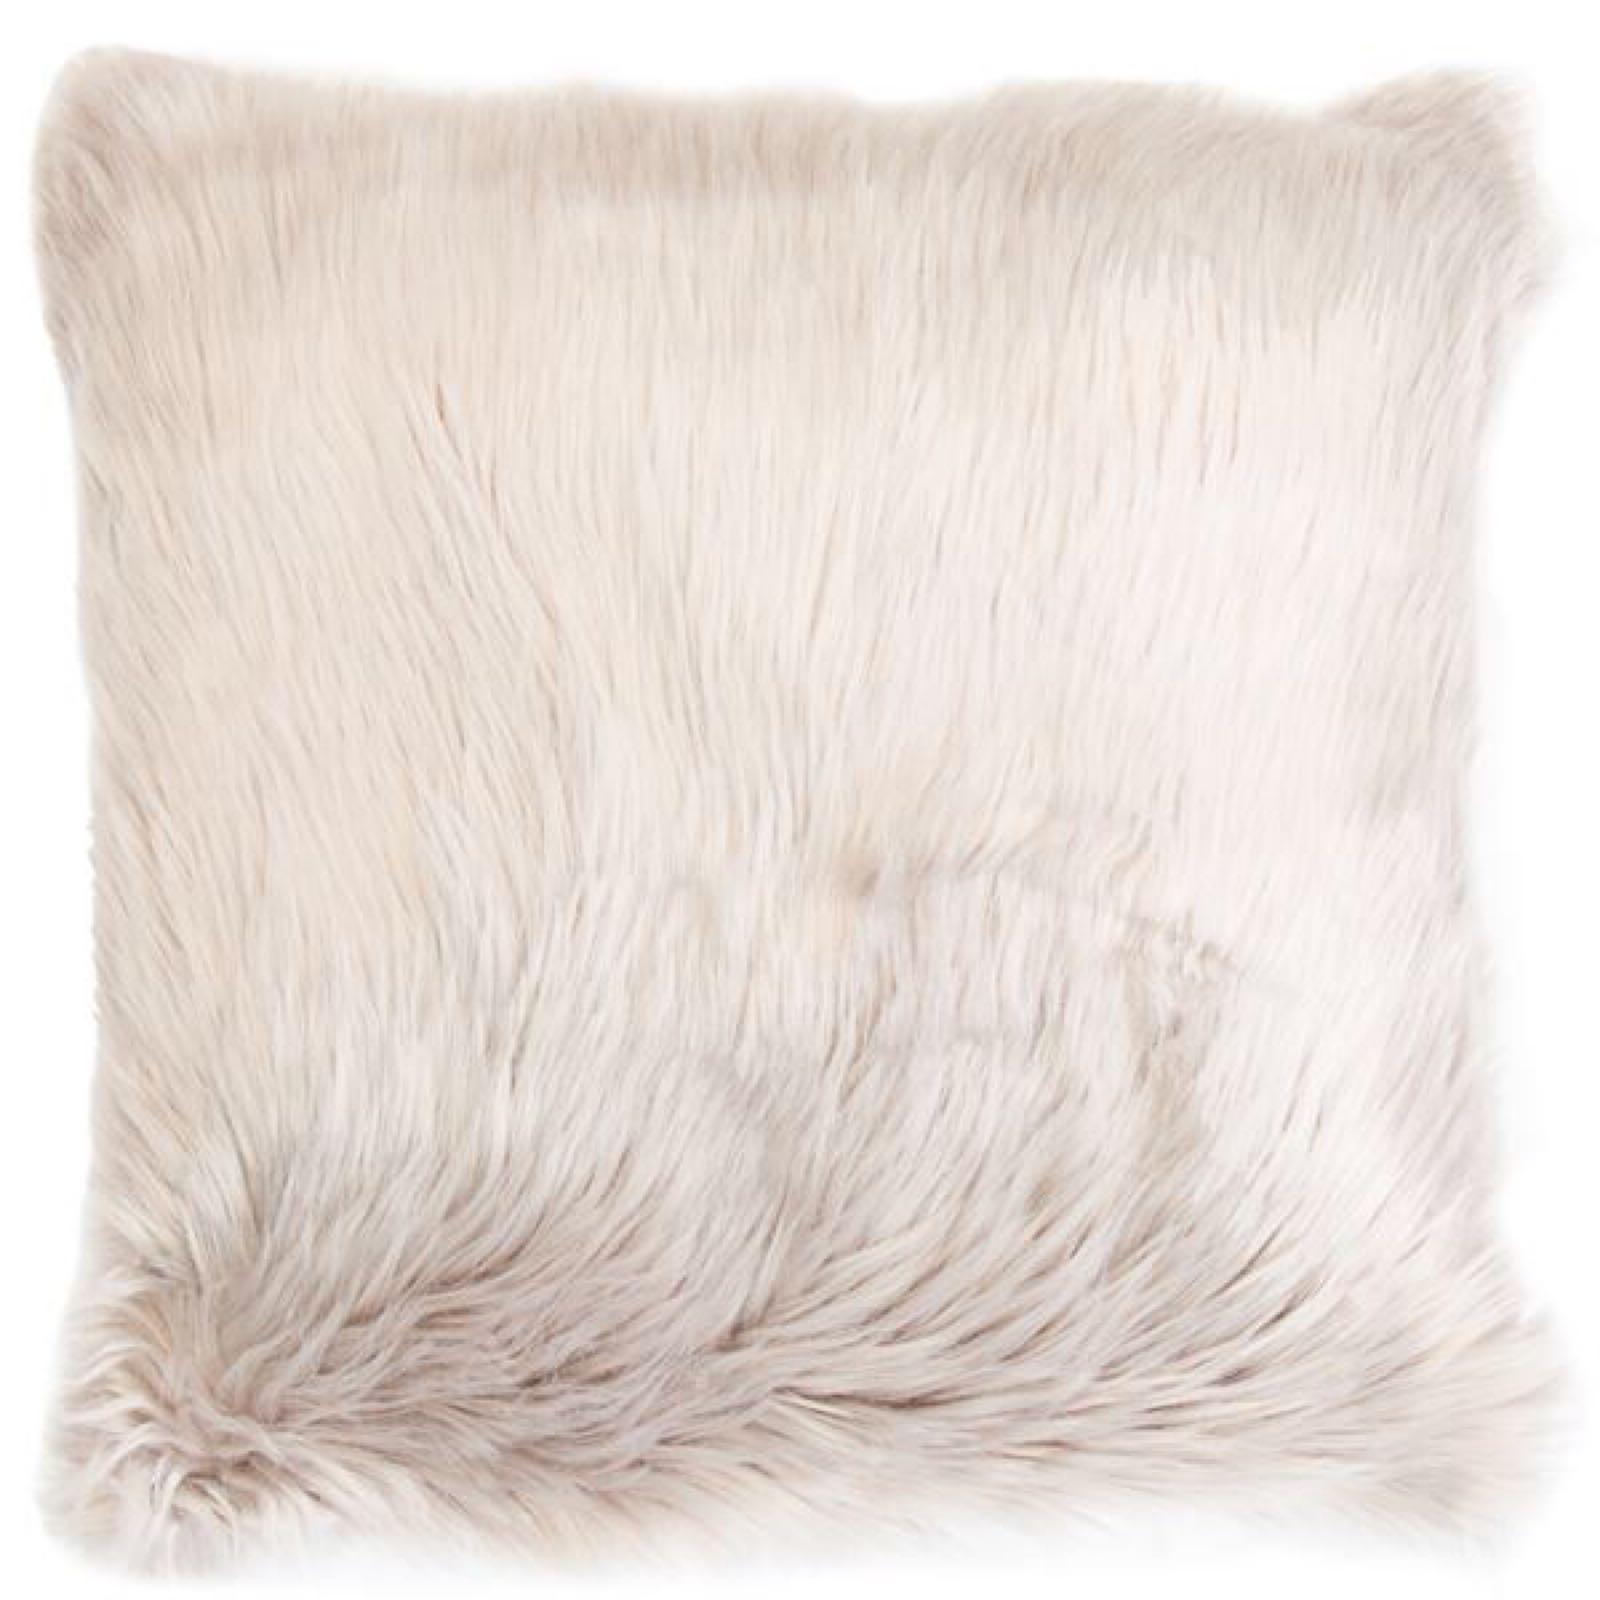 Faux Sheepskin Cushion - Taupe